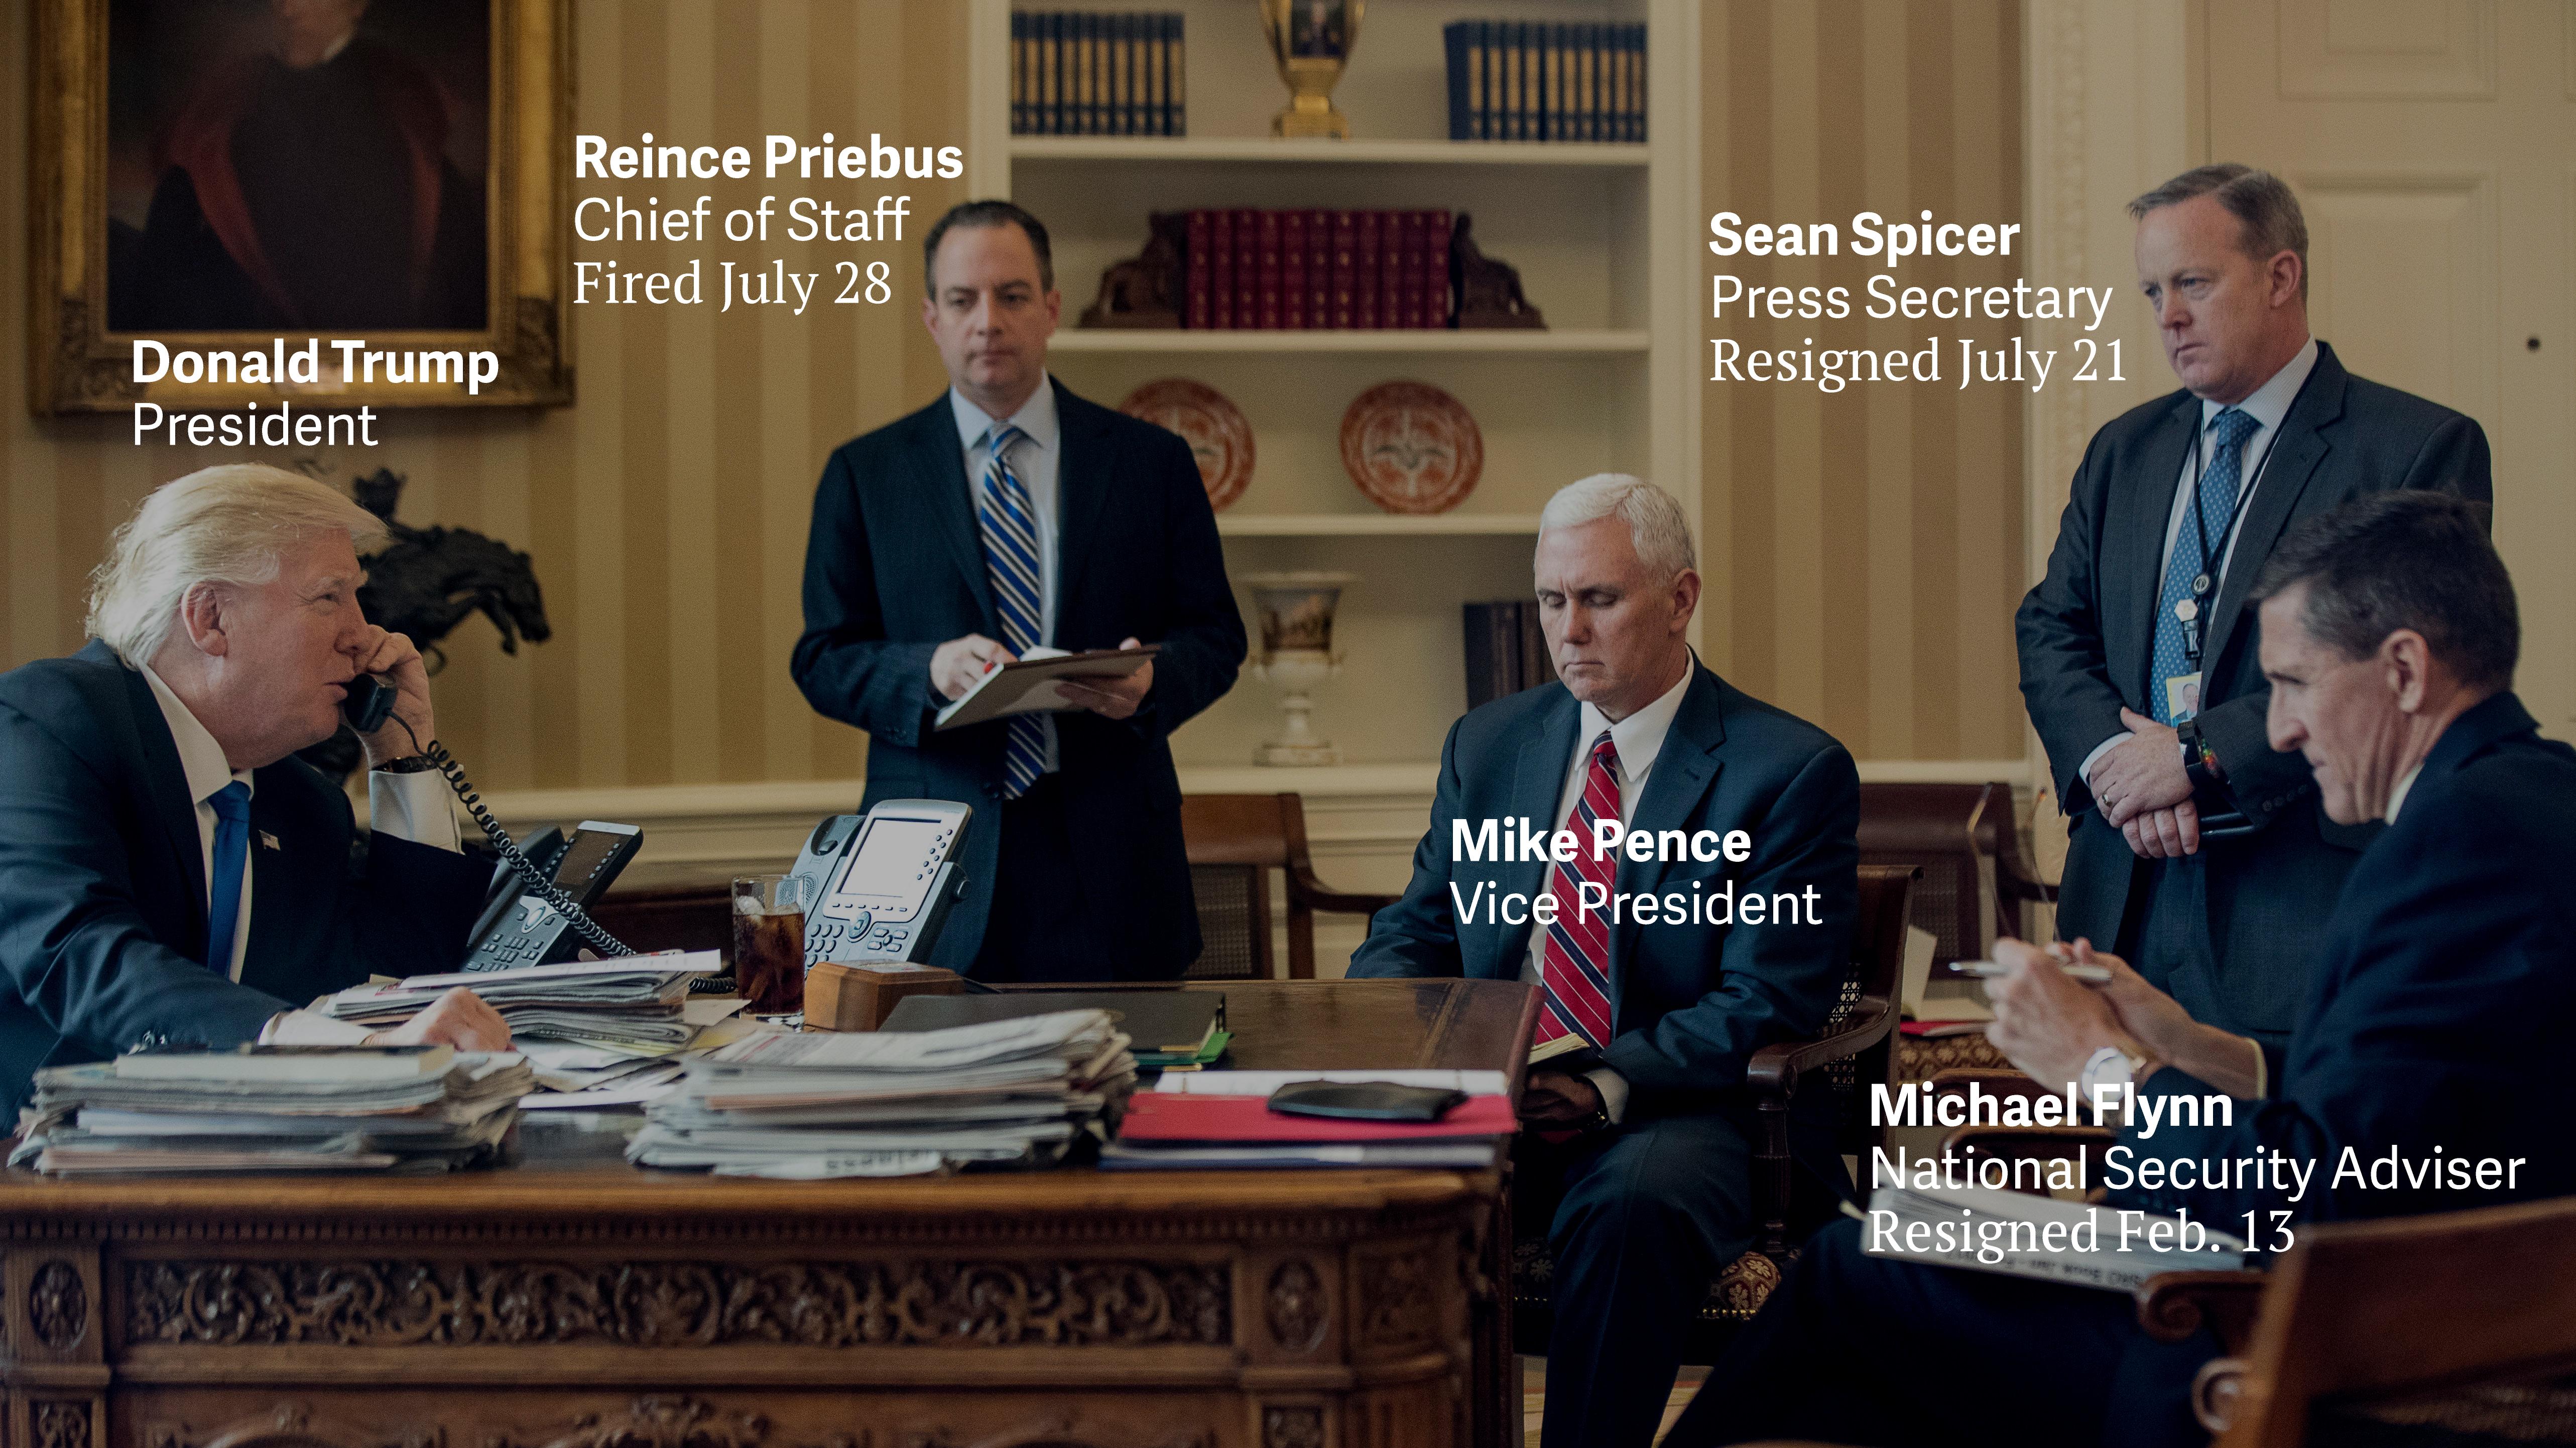 Trump-Priebus-Spicer-Pence-Flynn-Putin-phone-call-16-9